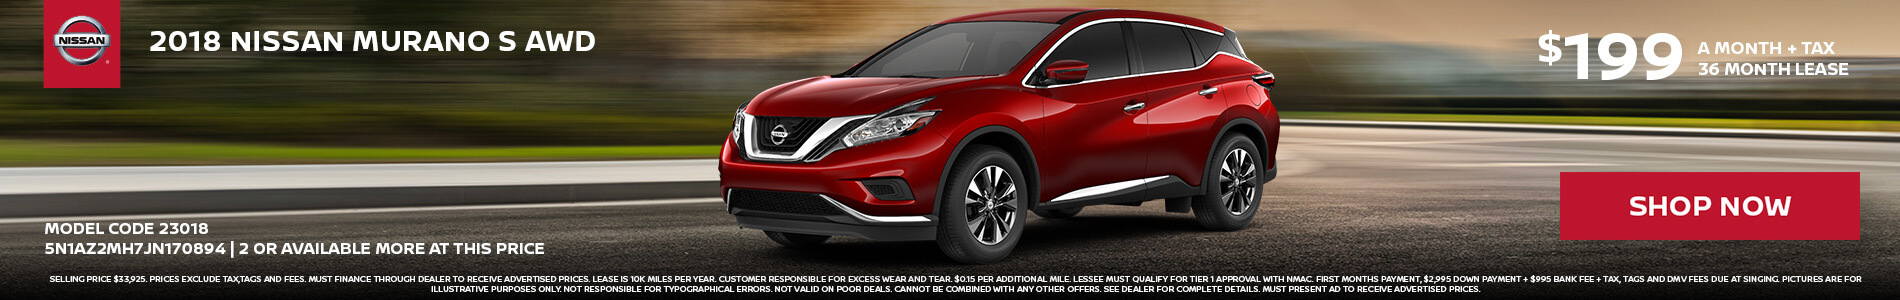 Nissan Murano $199 Lease